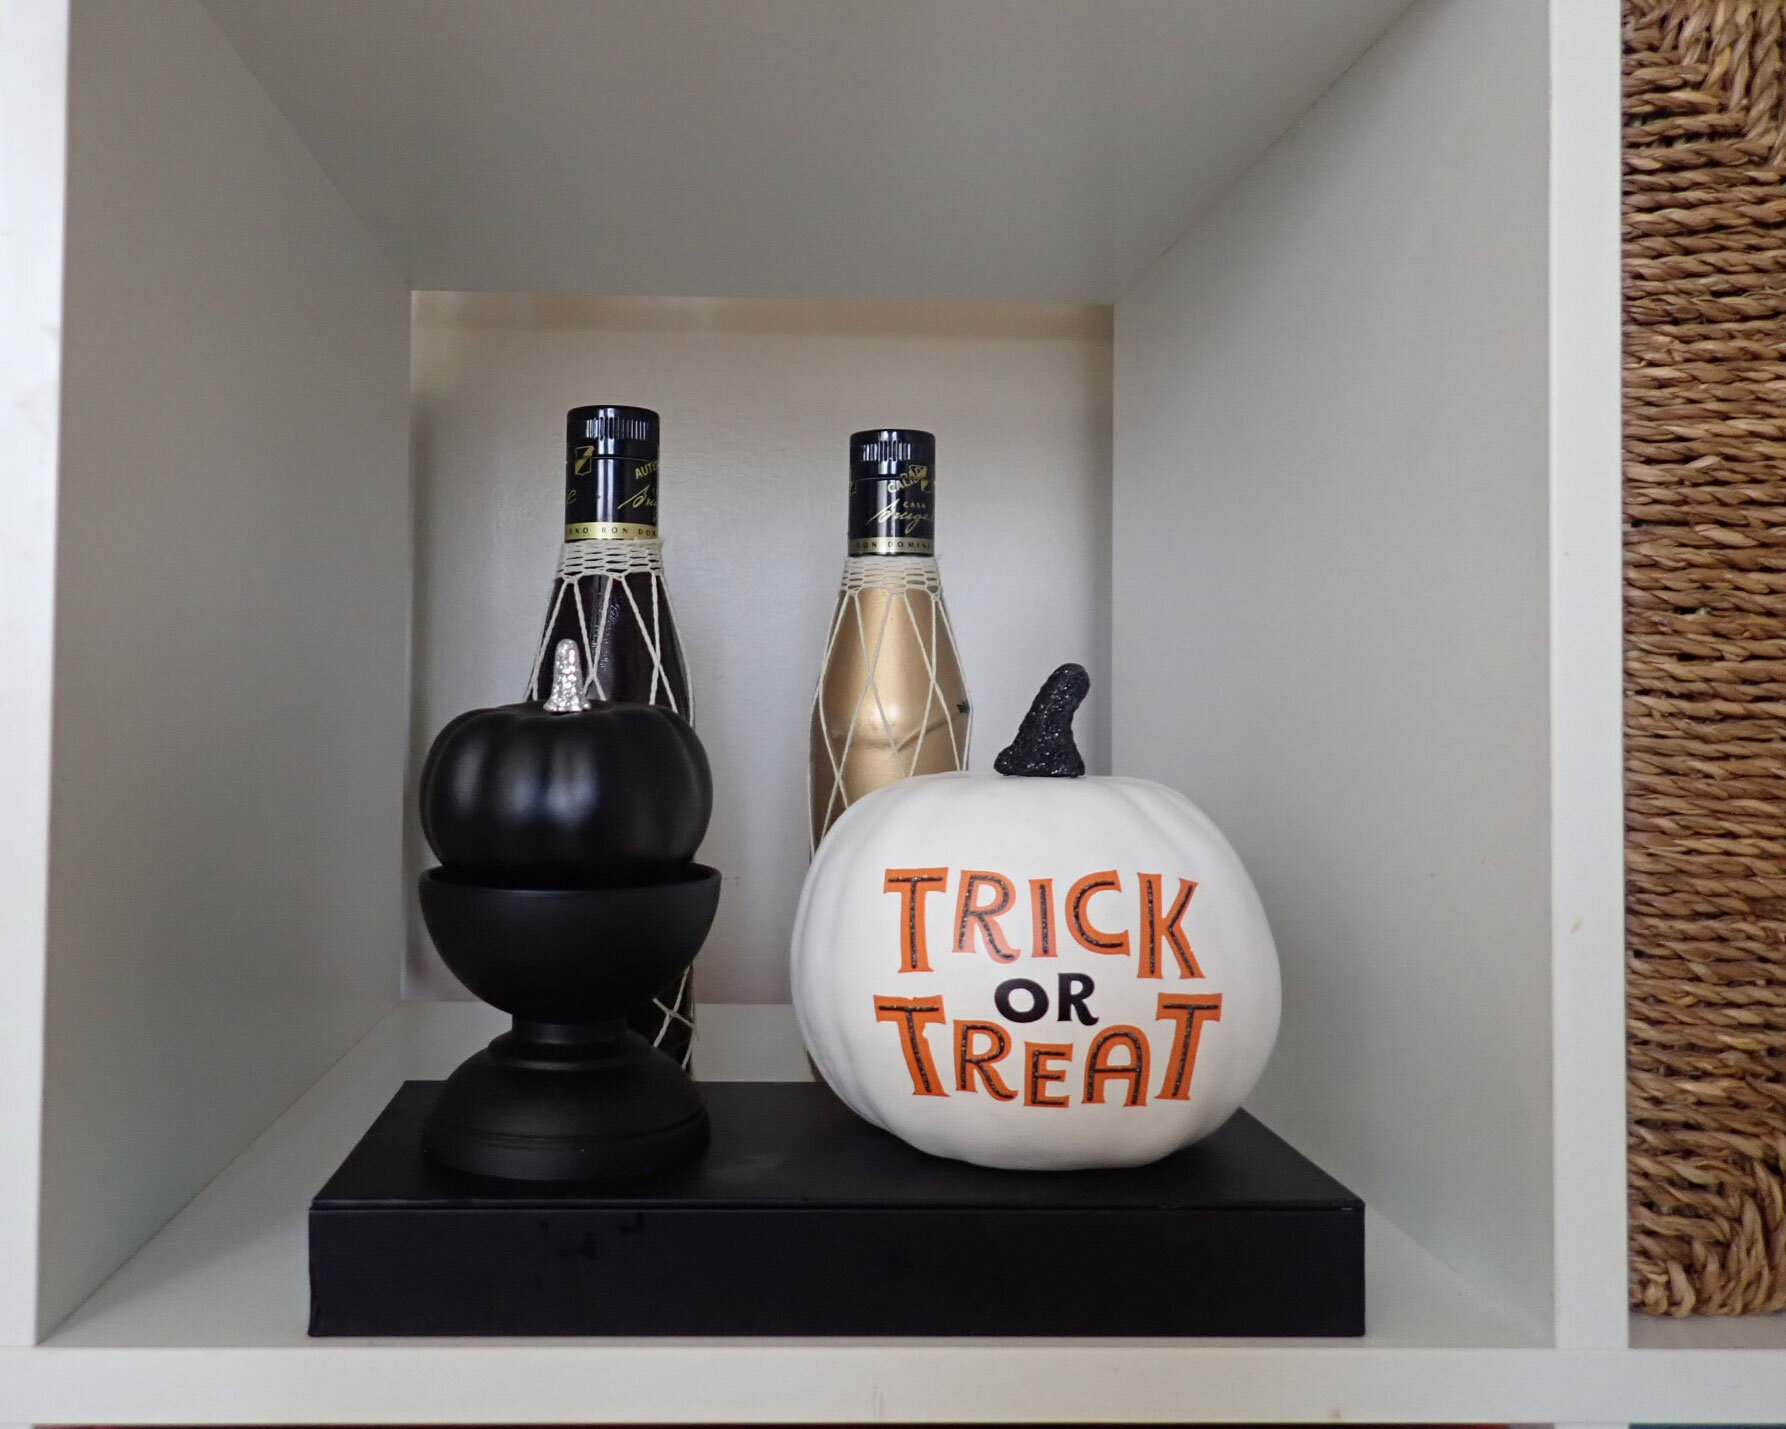 Indoor Halloween decor | Bookshelf Halloween Decor | Cute Indoor Halloween Decor | Halloween Decor Ideas | Elegant Halloween Decor | Black and white Halloween decor | www.anajacqueline.com